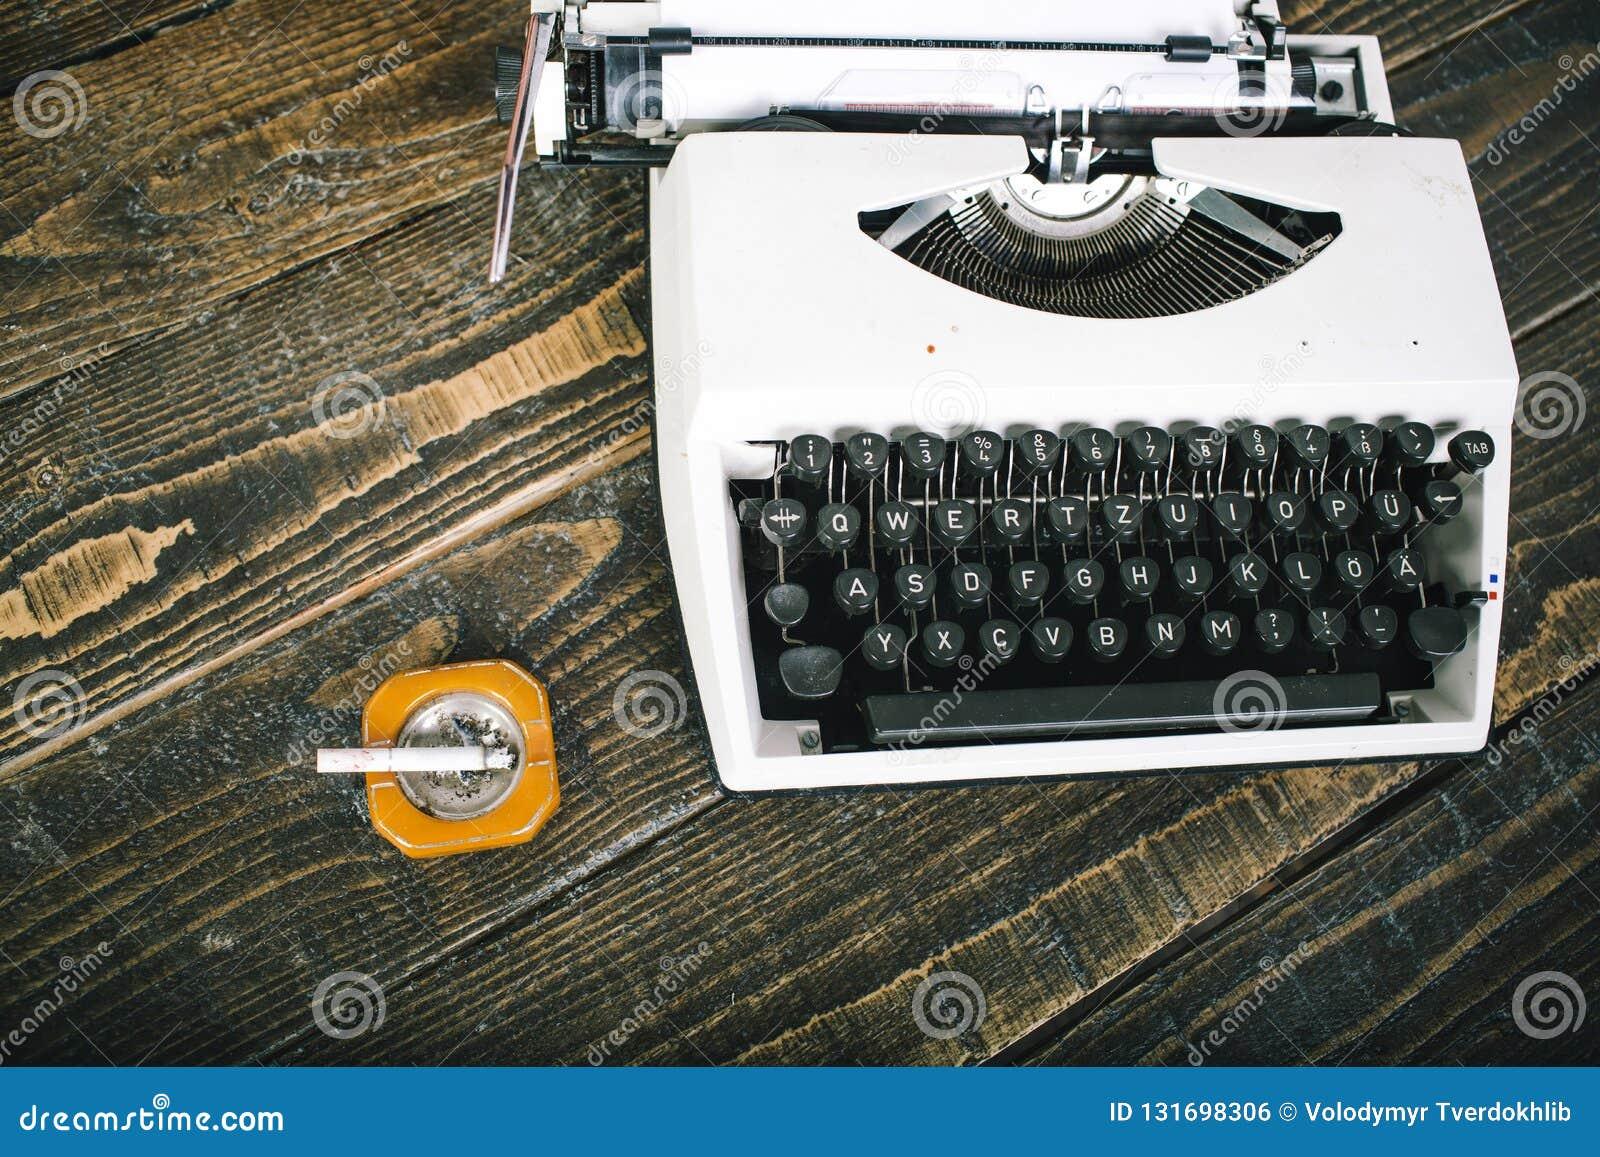 Cool Classic Is Always Stylish Vintage Retro Typewriter Machine Download Free Architecture Designs Embacsunscenecom